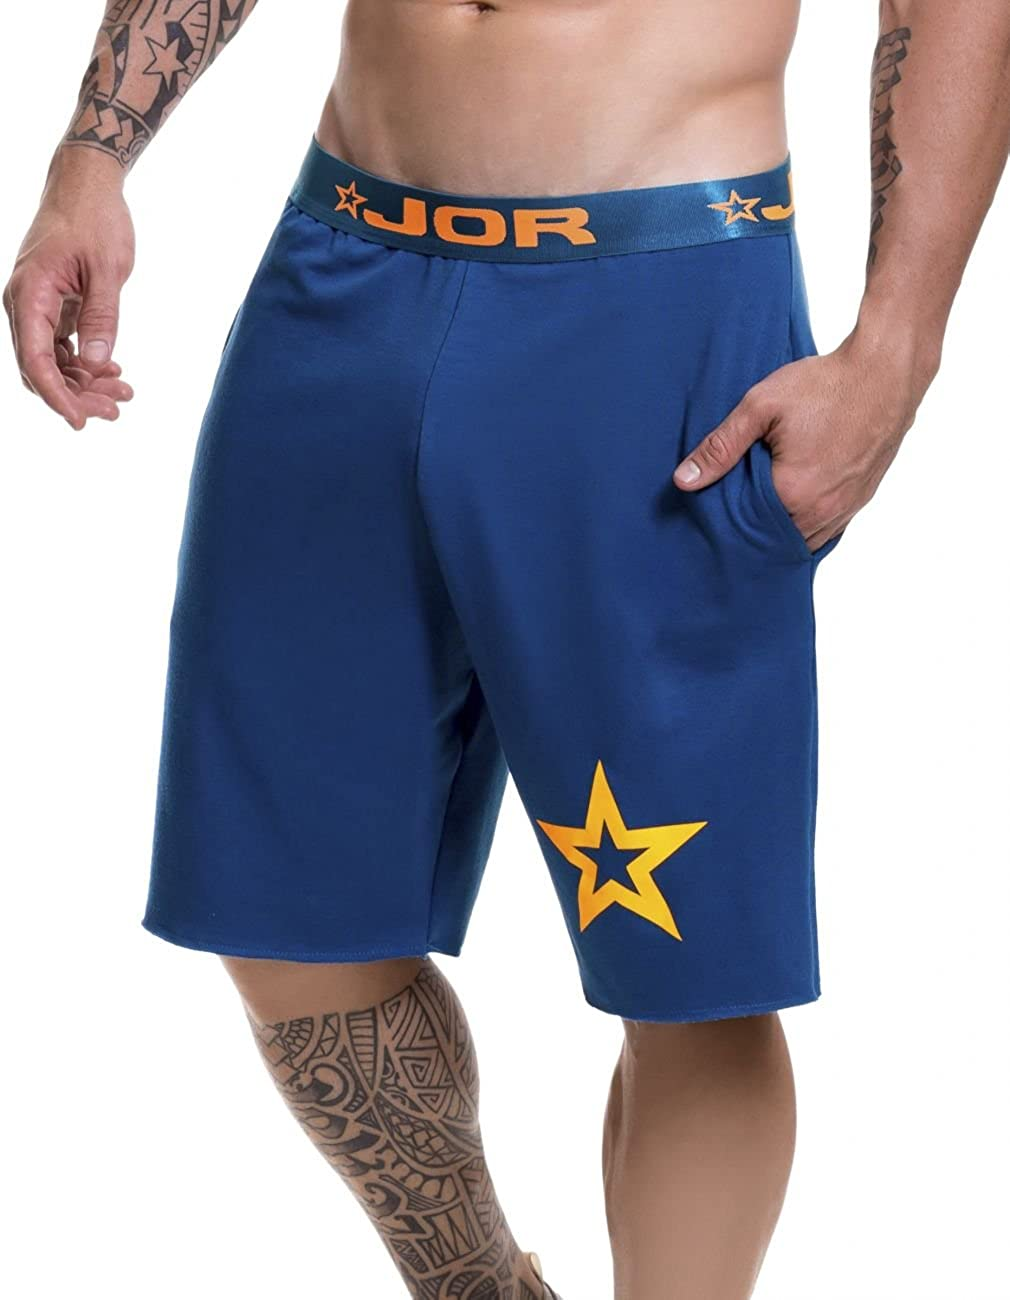 Petrol_style_520 Large J&Or JOR Masculine Athletic Shorts Sports Wear Black